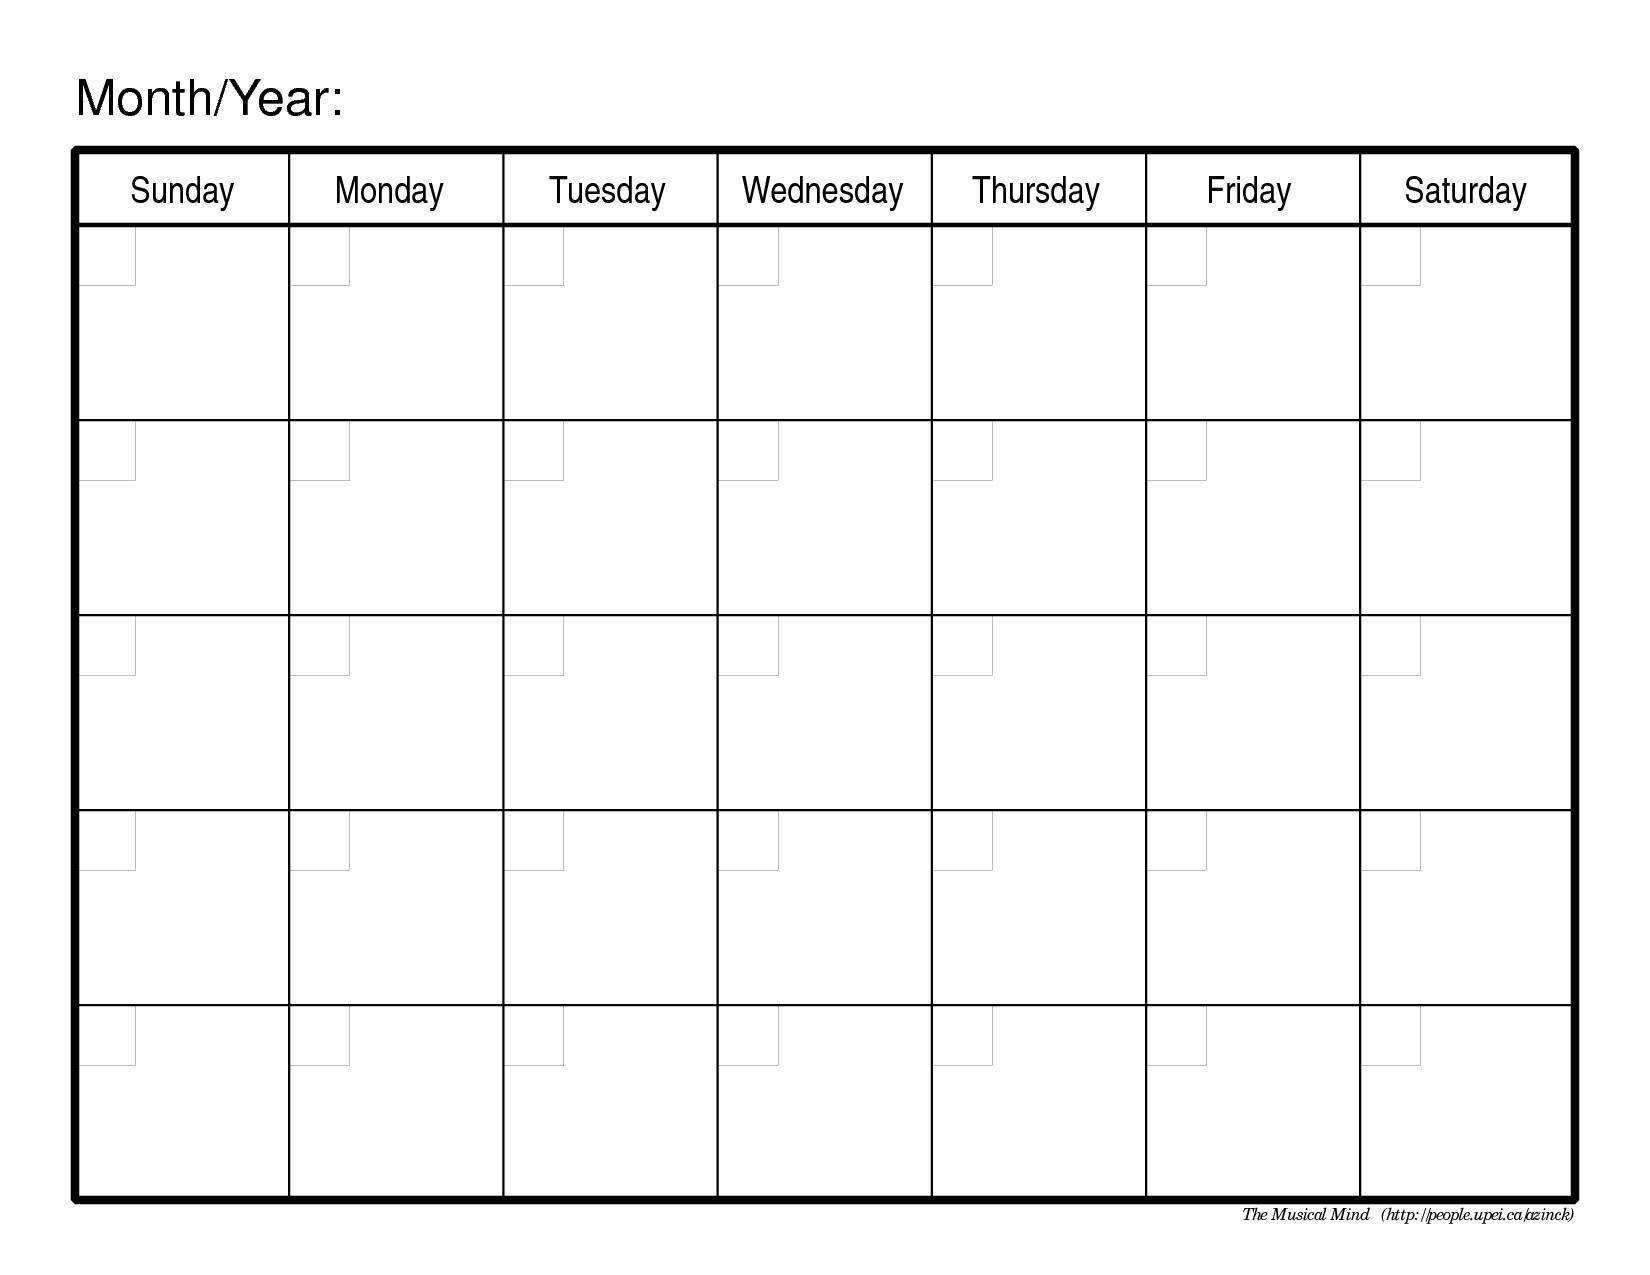 Fillable Printable Calendar | Hauck Mansion-Monday To Sunday Monthly Fillable Calendar